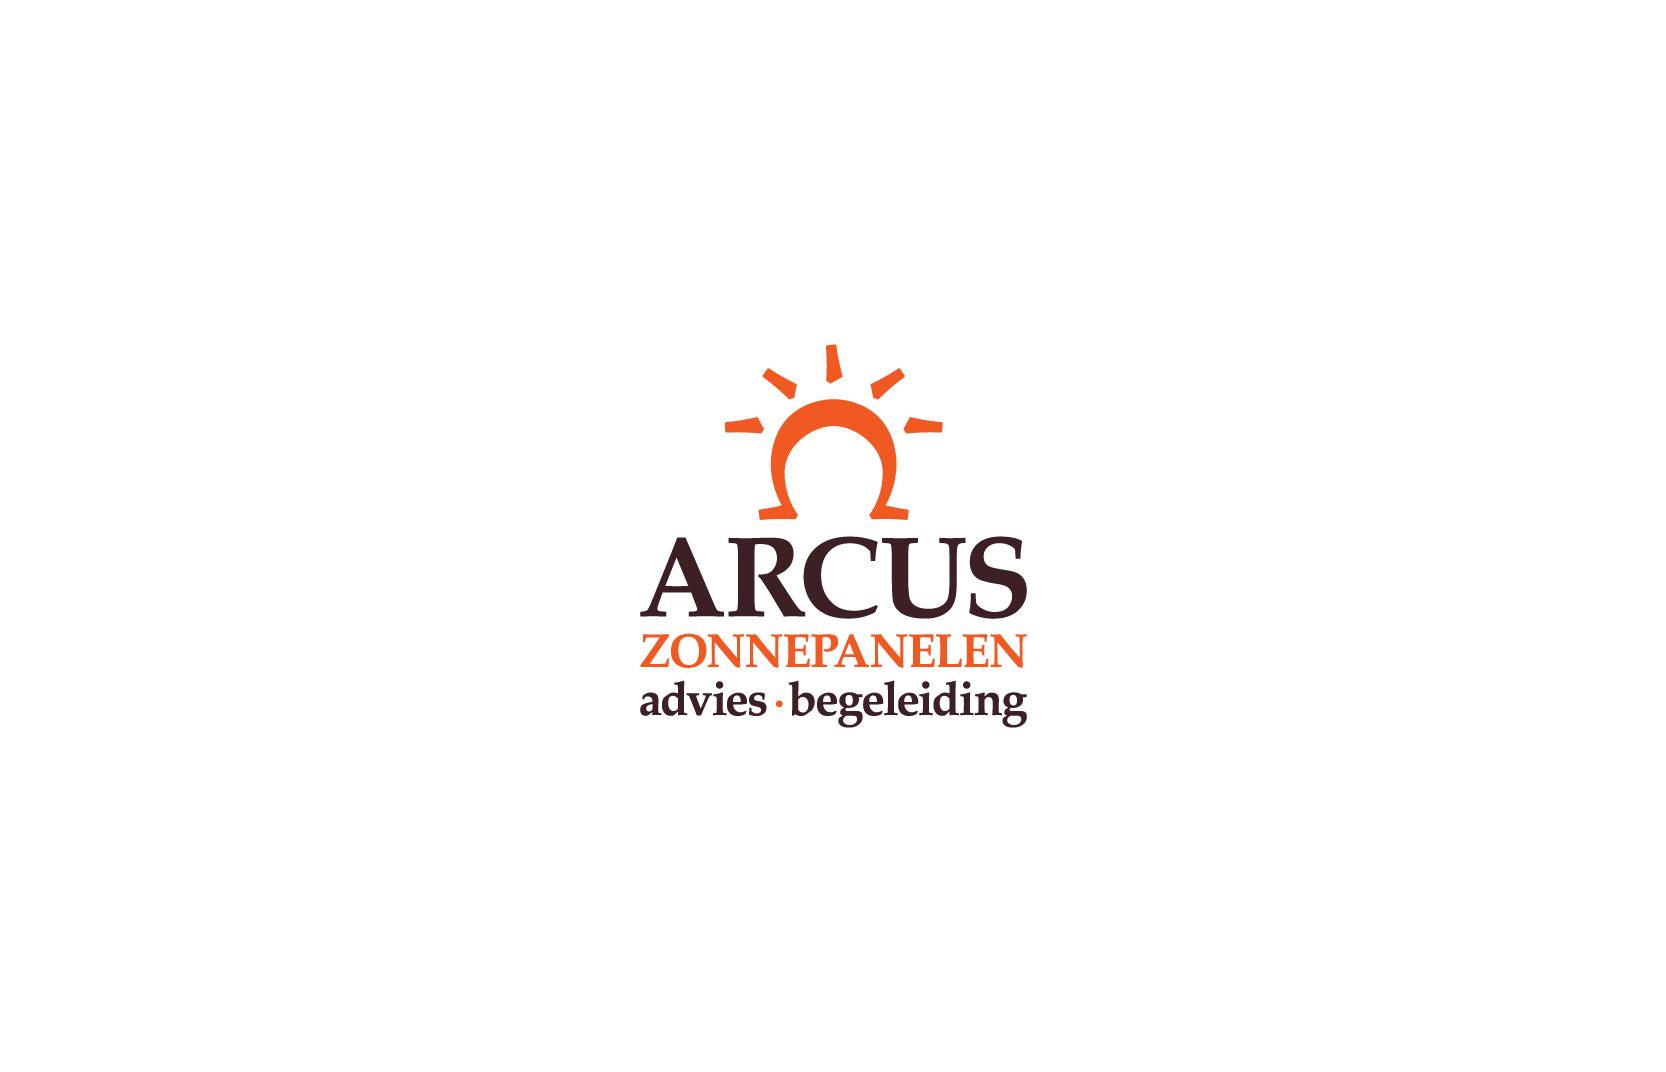 drukwerk_arcus_zonnepanelen_logo